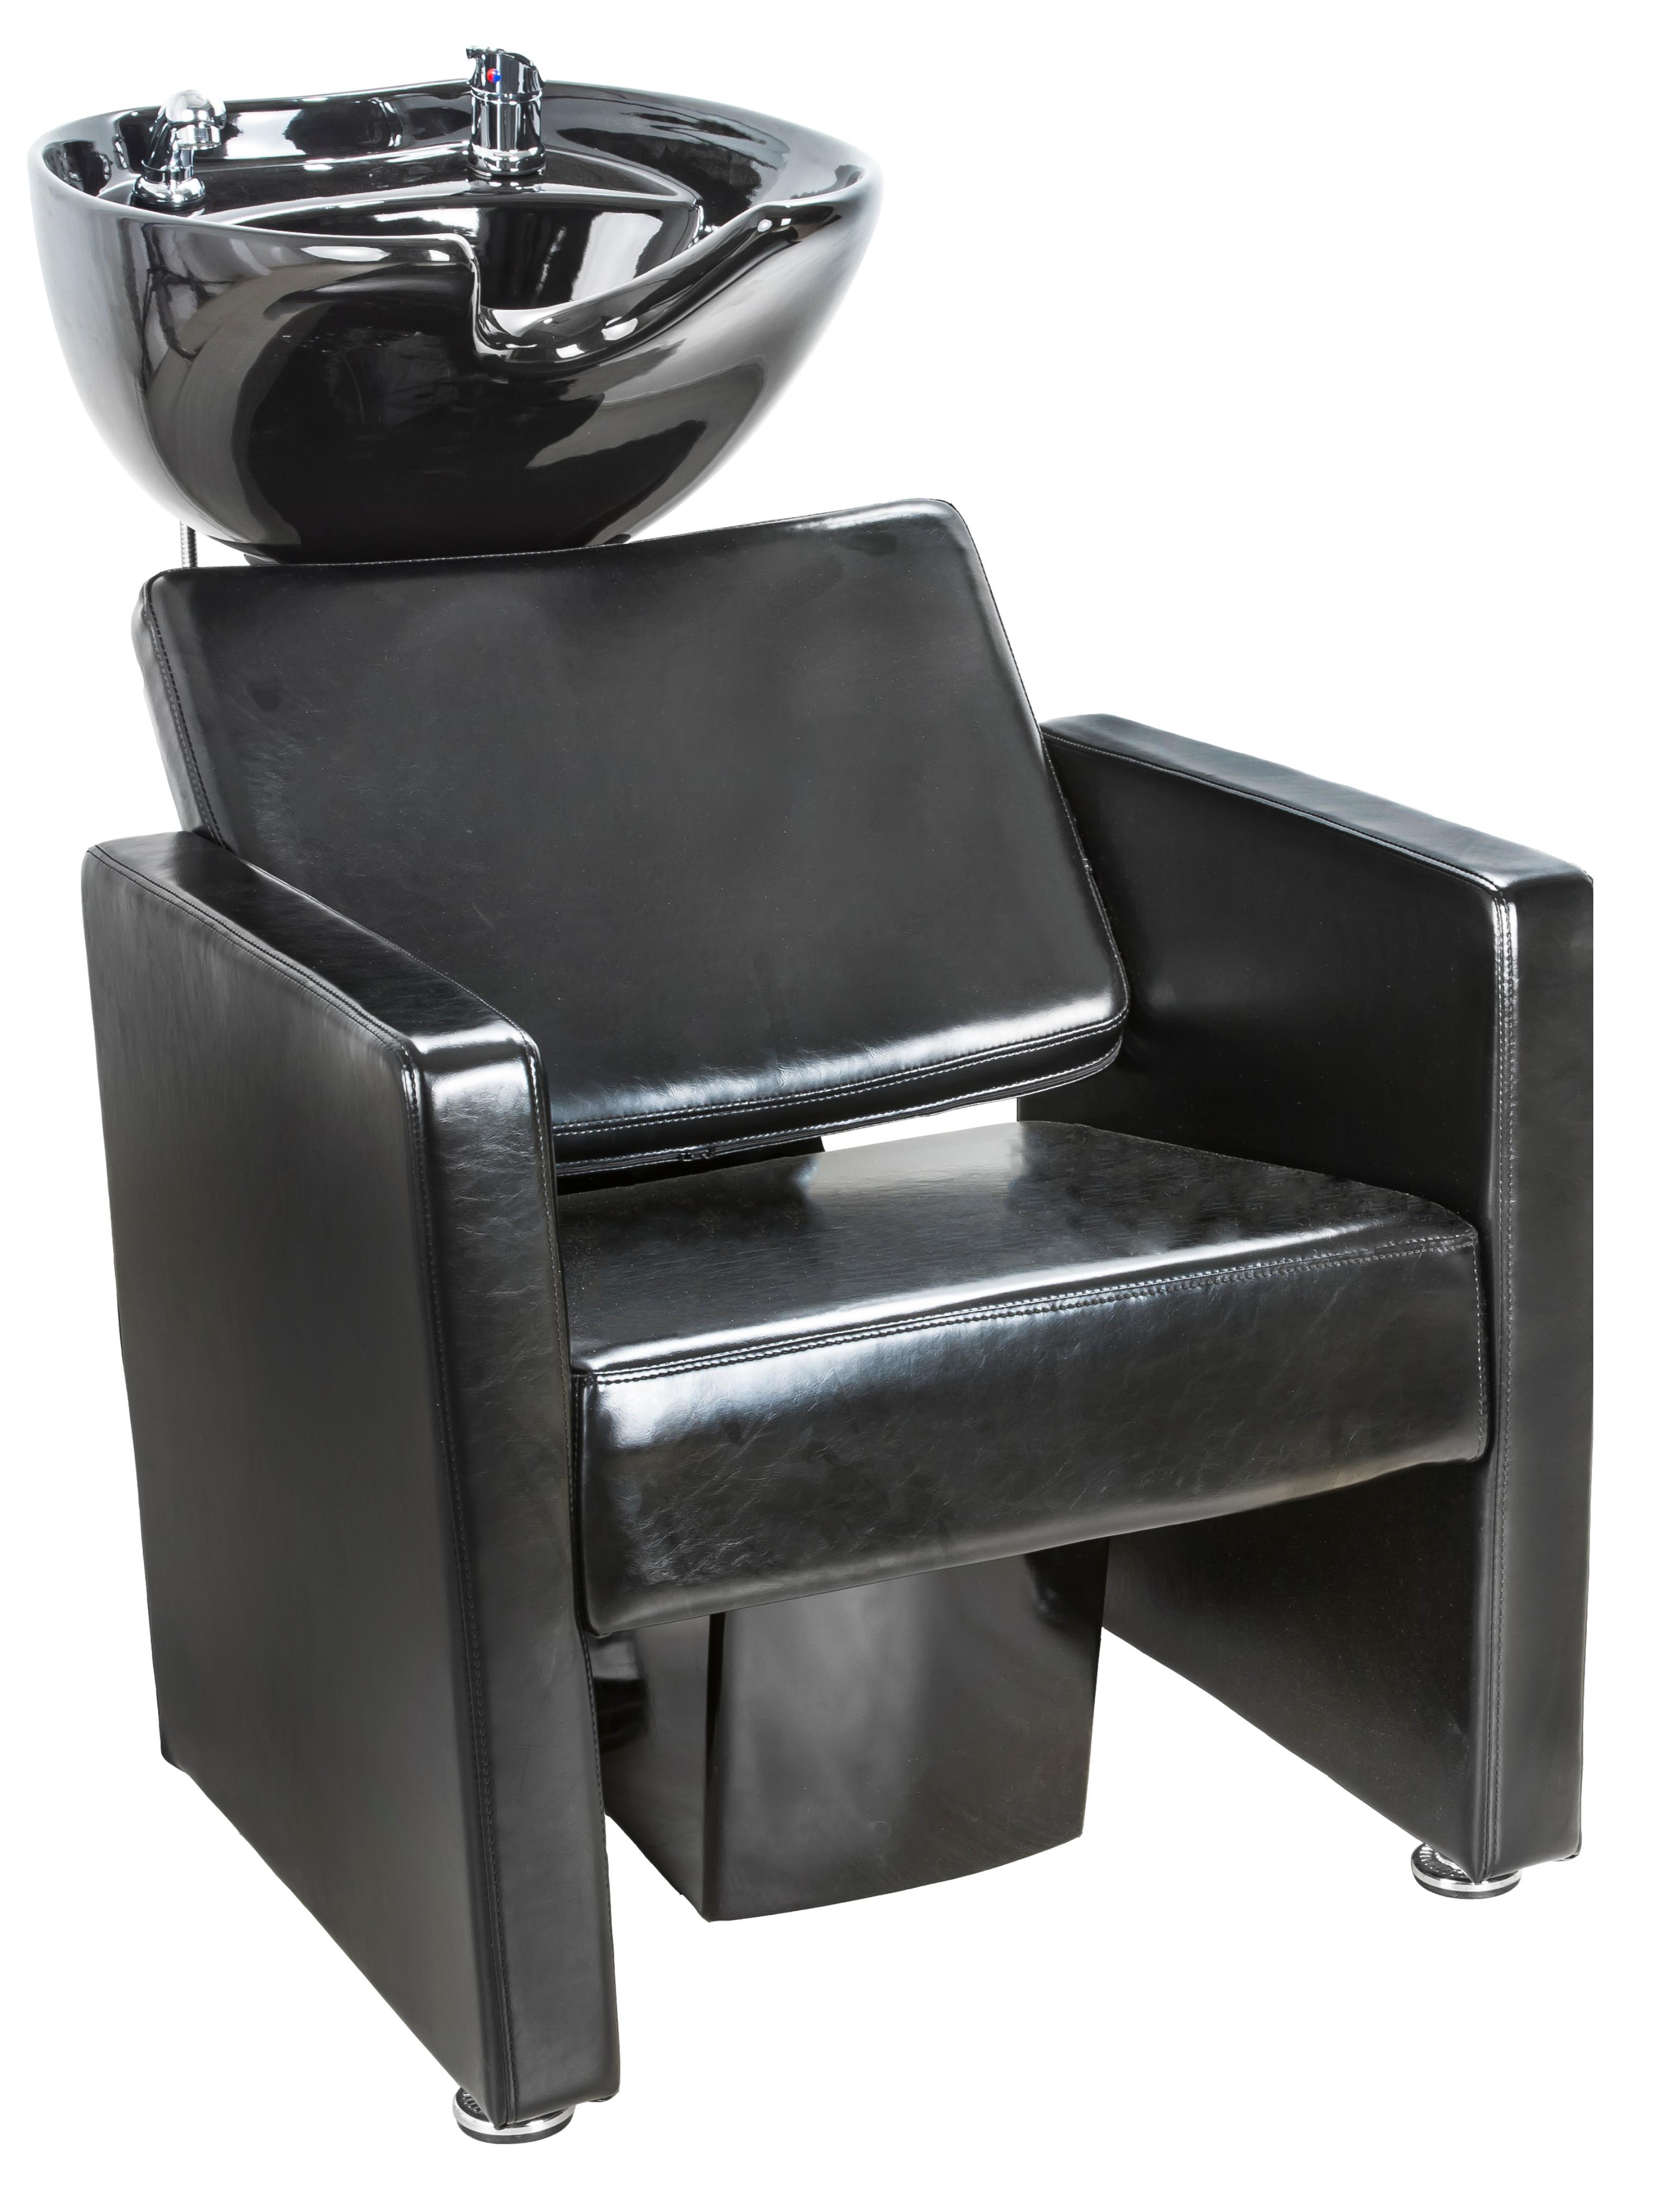 Kadeřnický mycí box SilverFox 558 - černý + DÁREK ZDARMA